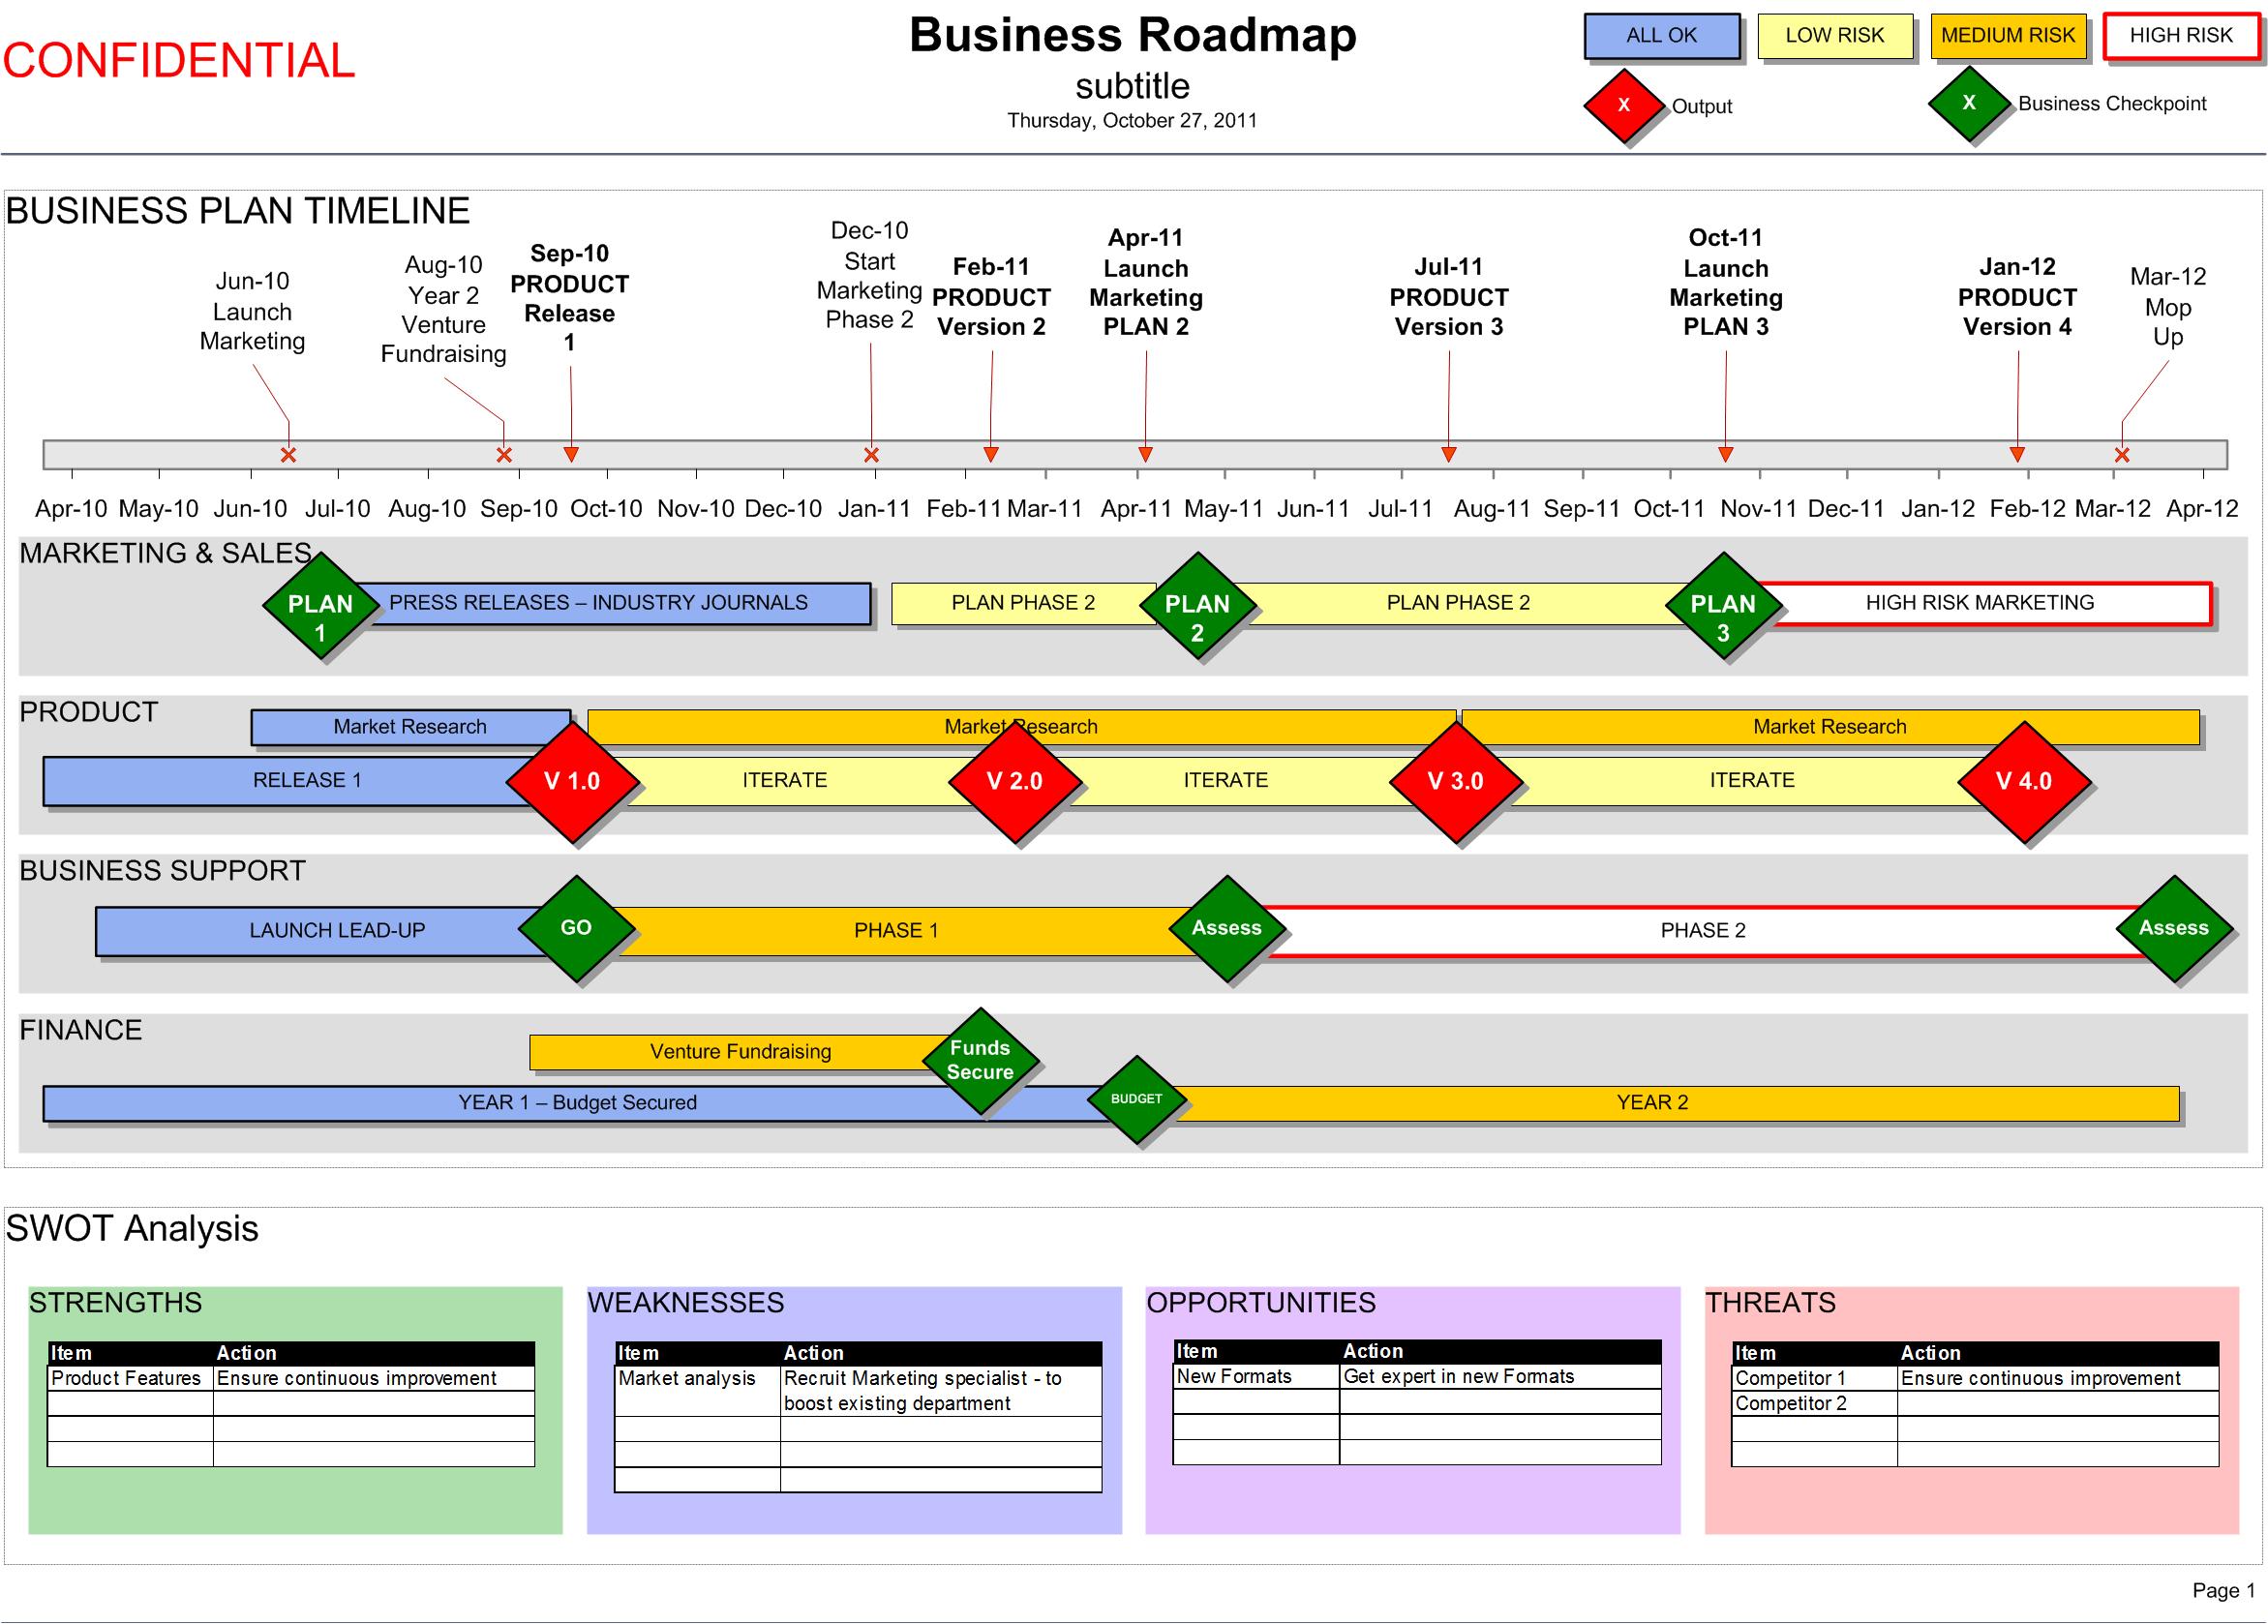 Strategic Business Plan Roadmap